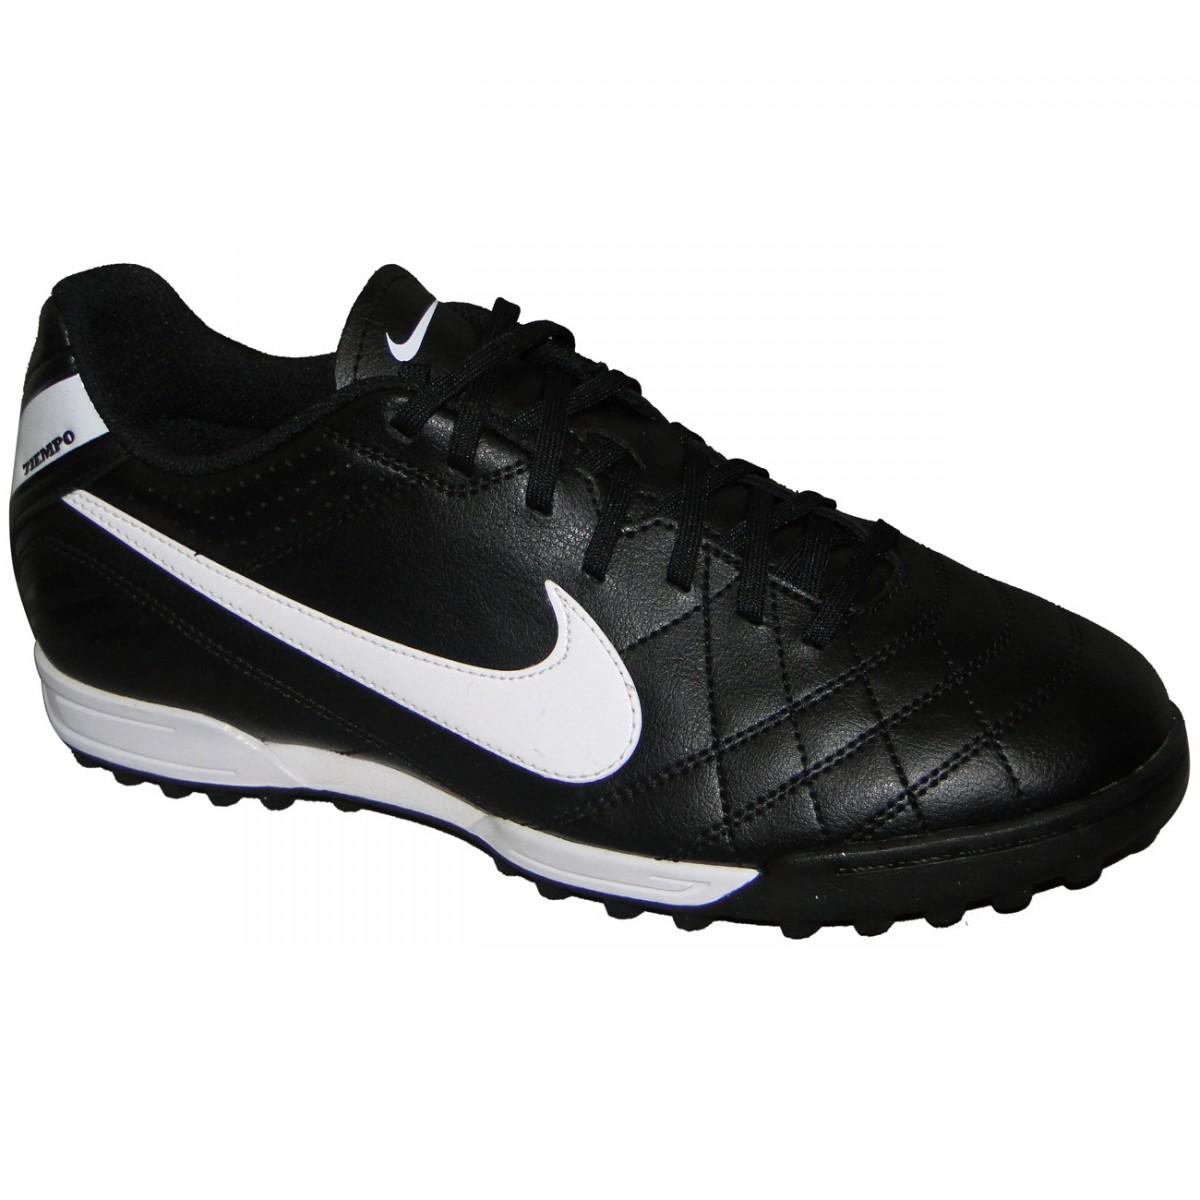 Chuteira Society Nike Tiempo Natural Iv 454334 018 - PRETO BRANCO LARANJA - Chuteira  Nike e3b1684b76ca4